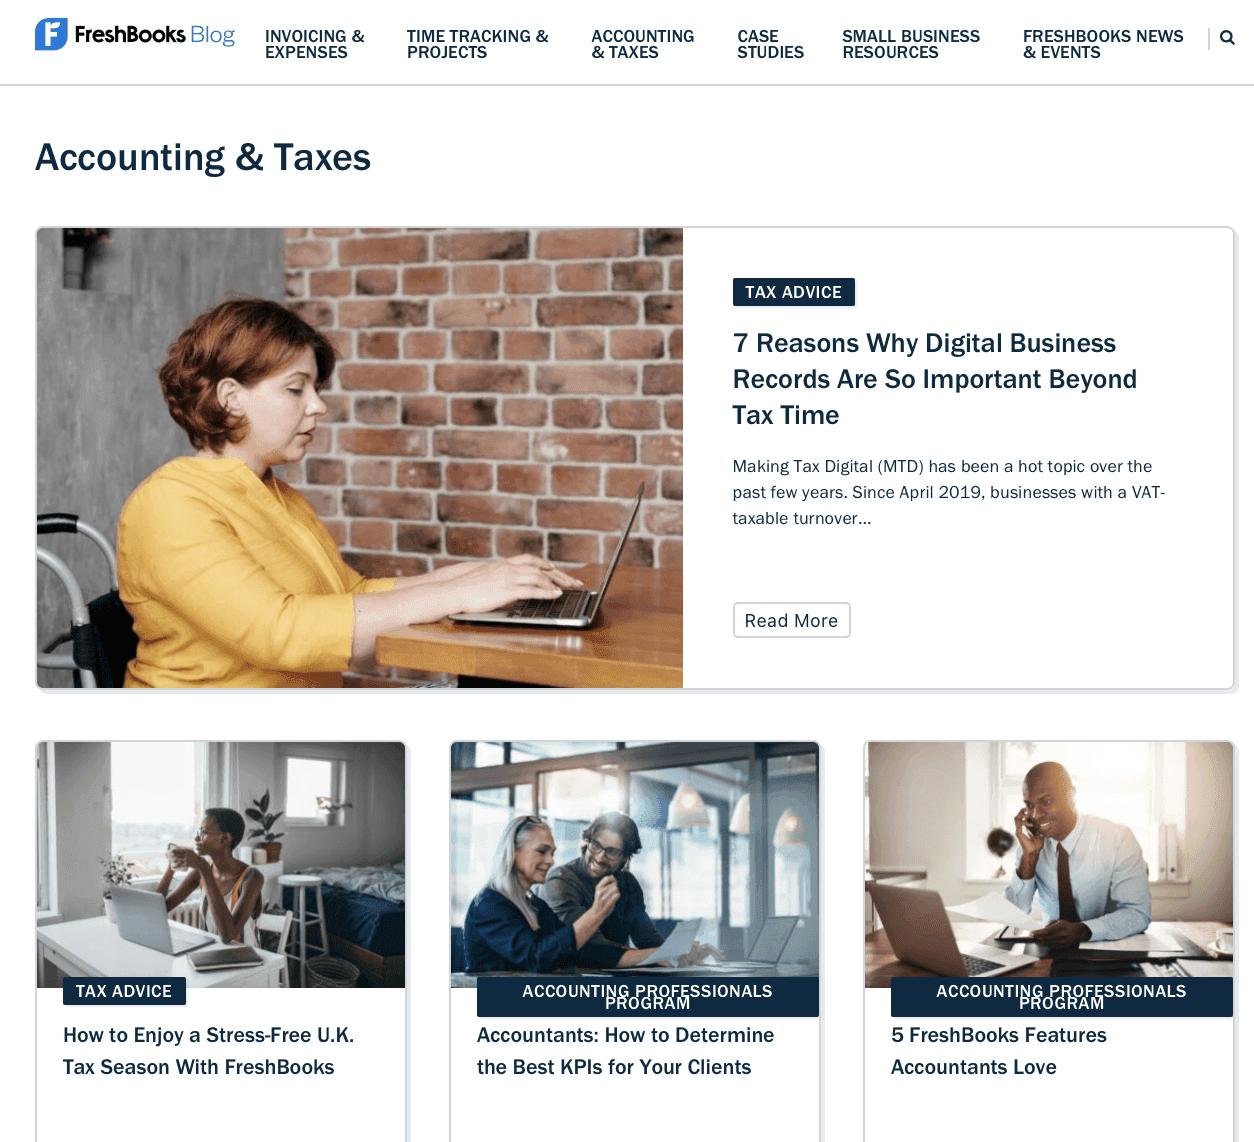 FreshBooks blog homepage